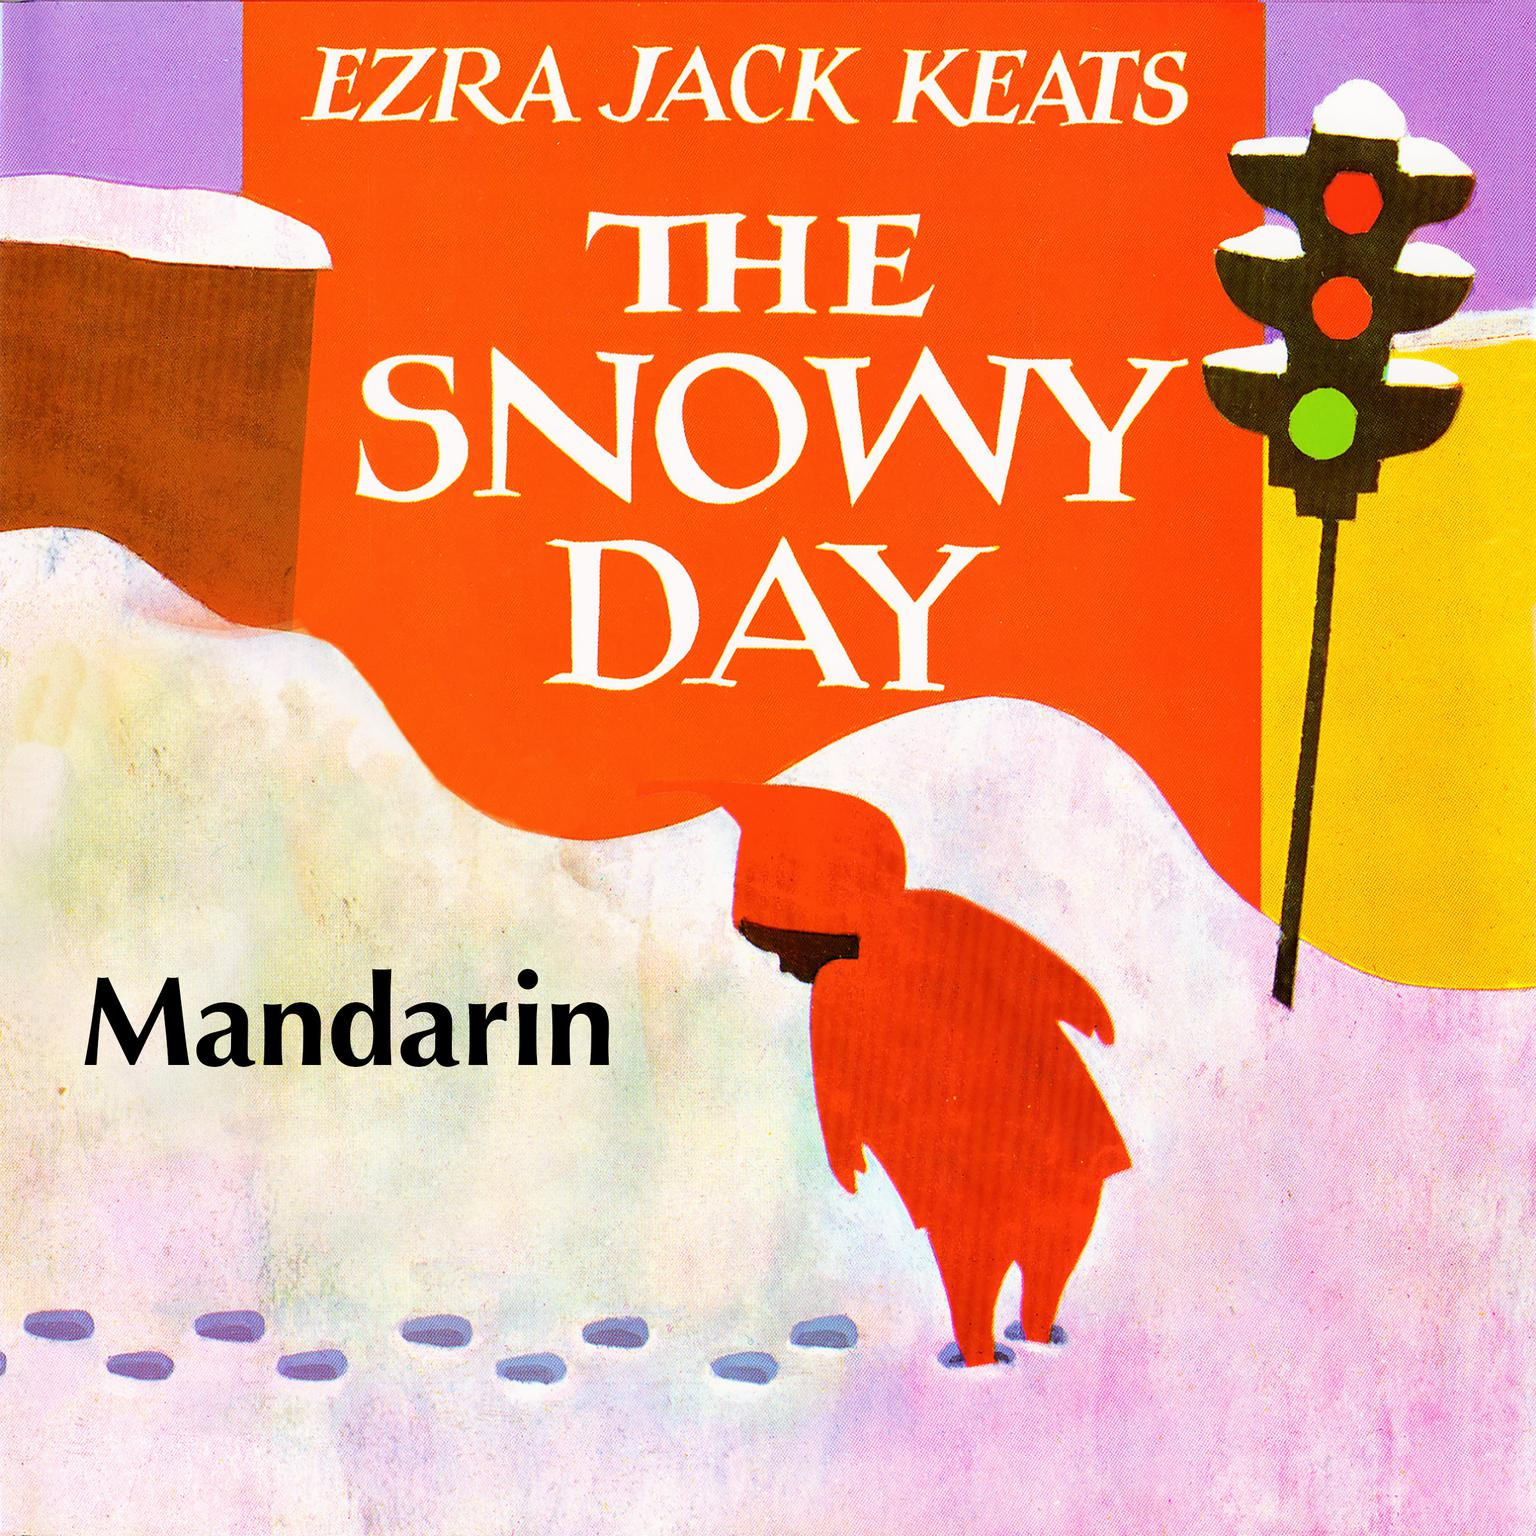 The Snowy Day [Mandarin Edition] Audiobook, by Ezra Jack Keats